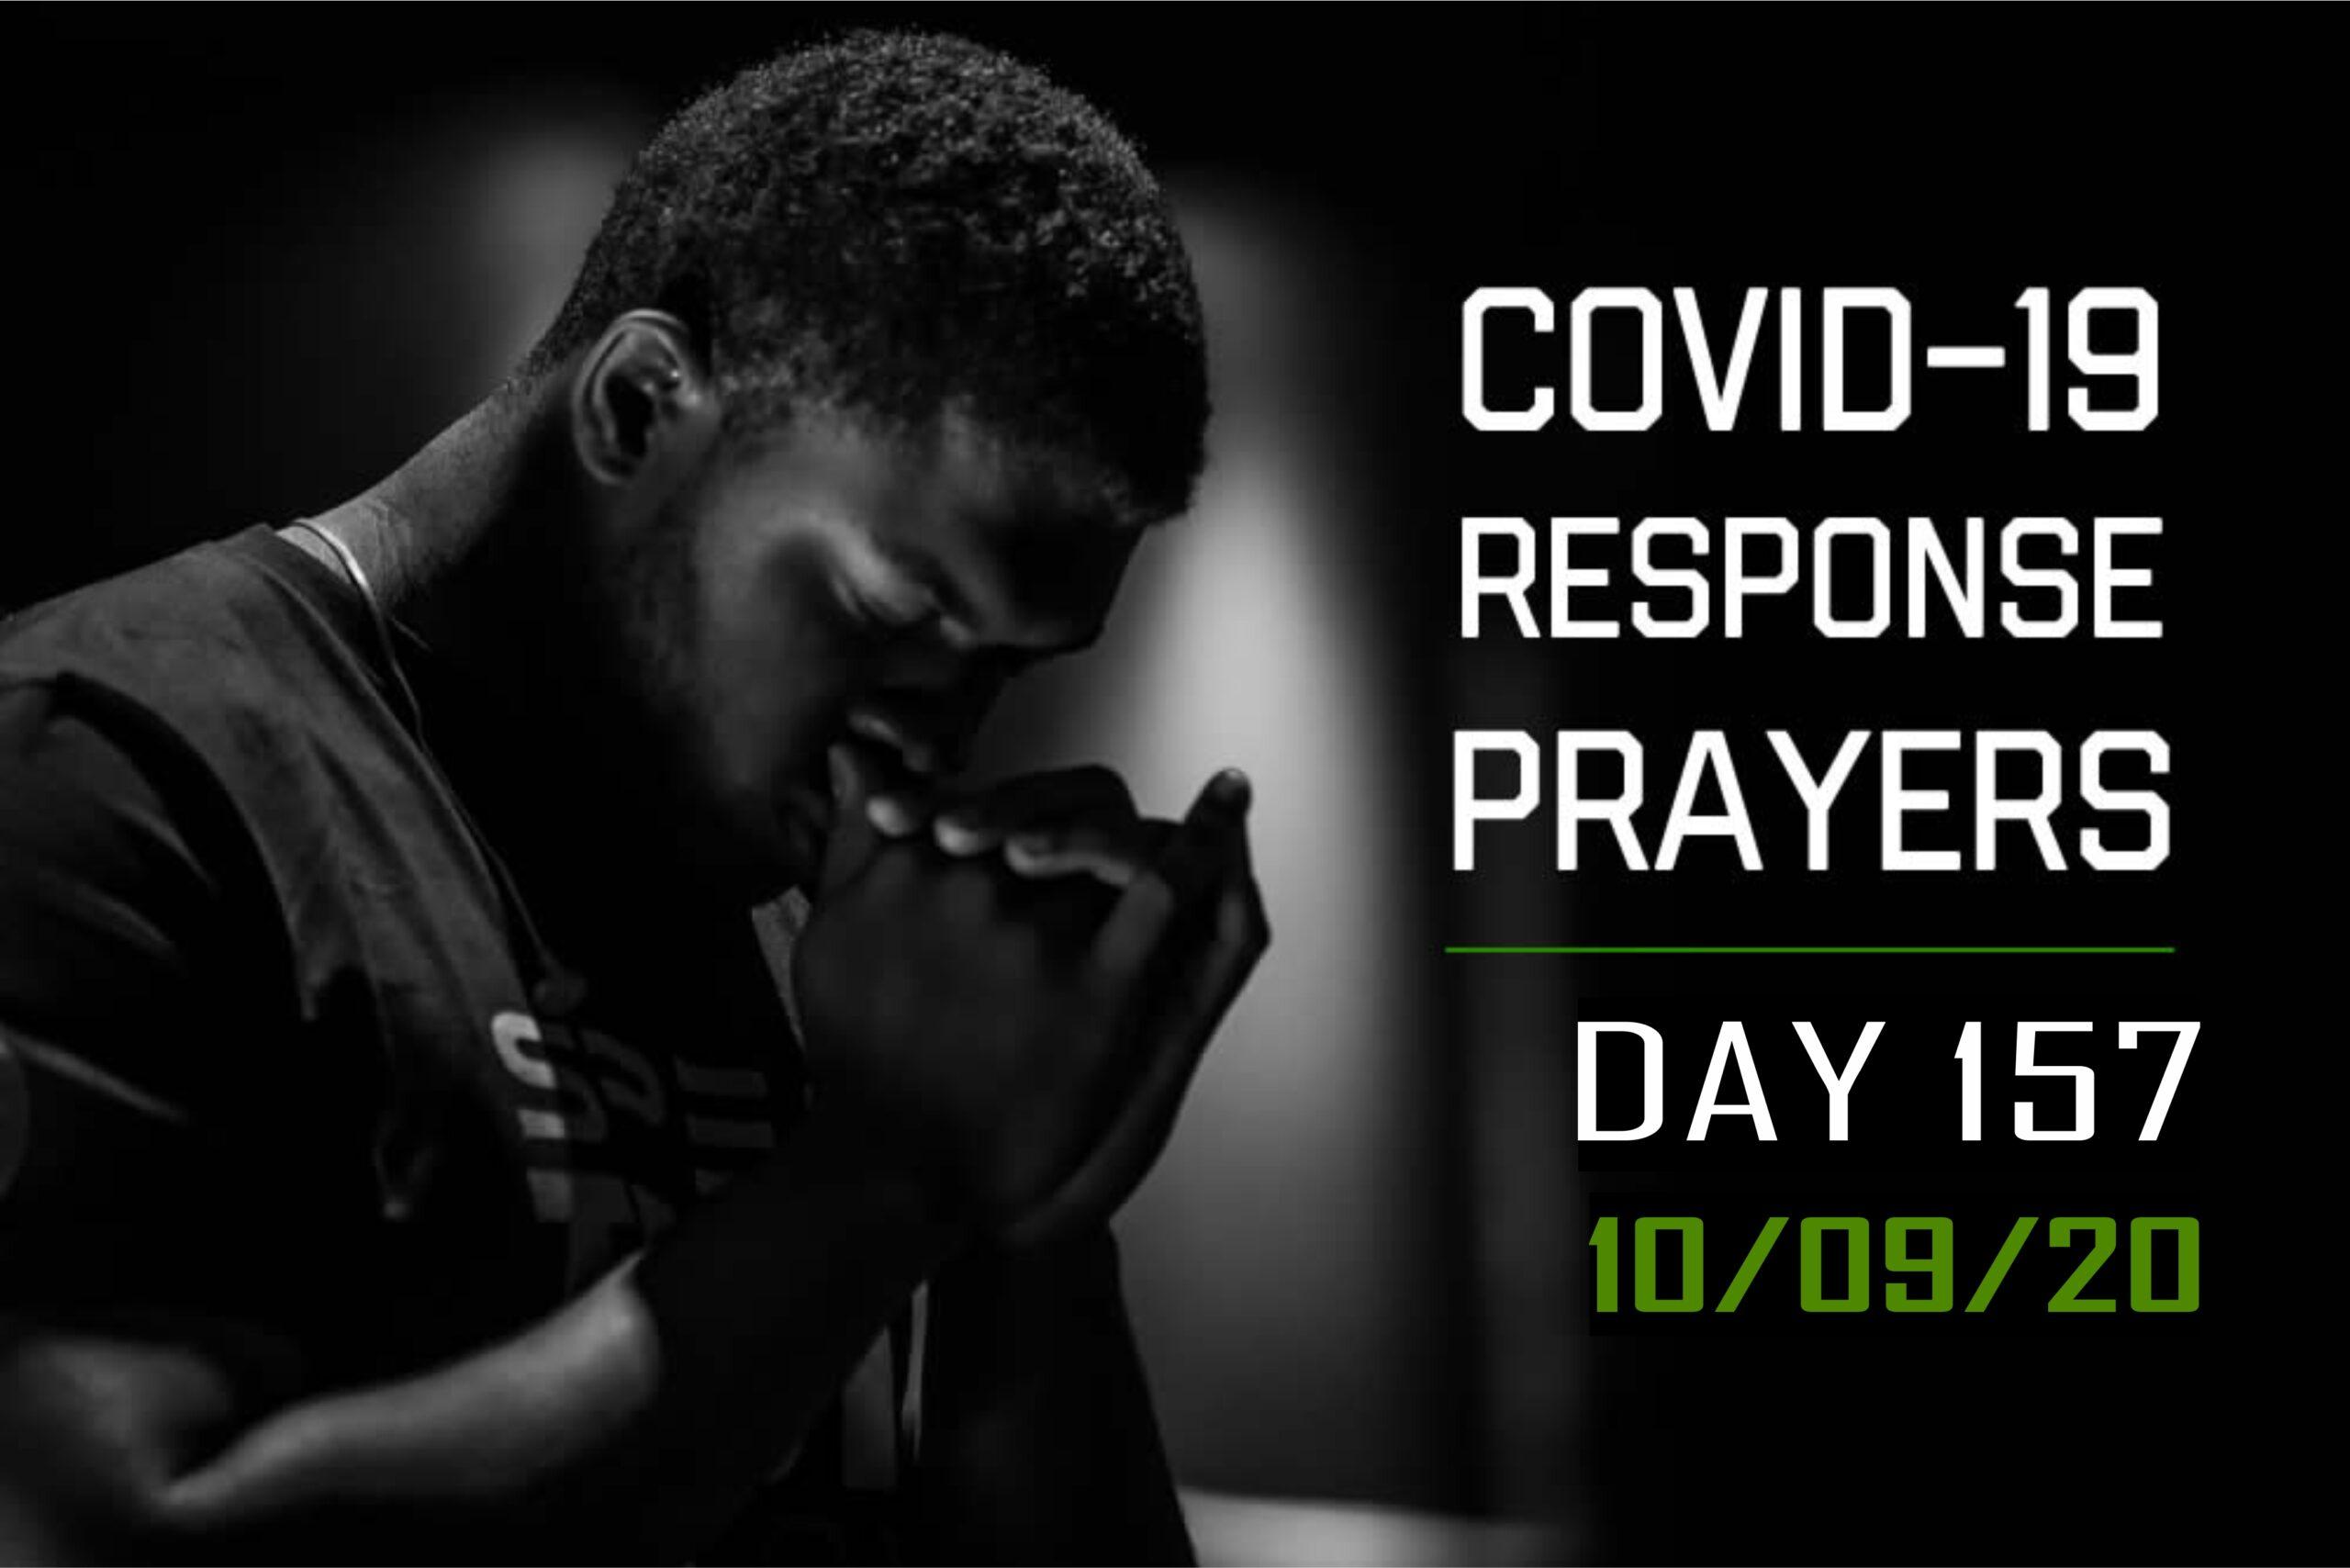 COVID-19 Response Prayers Day – 157